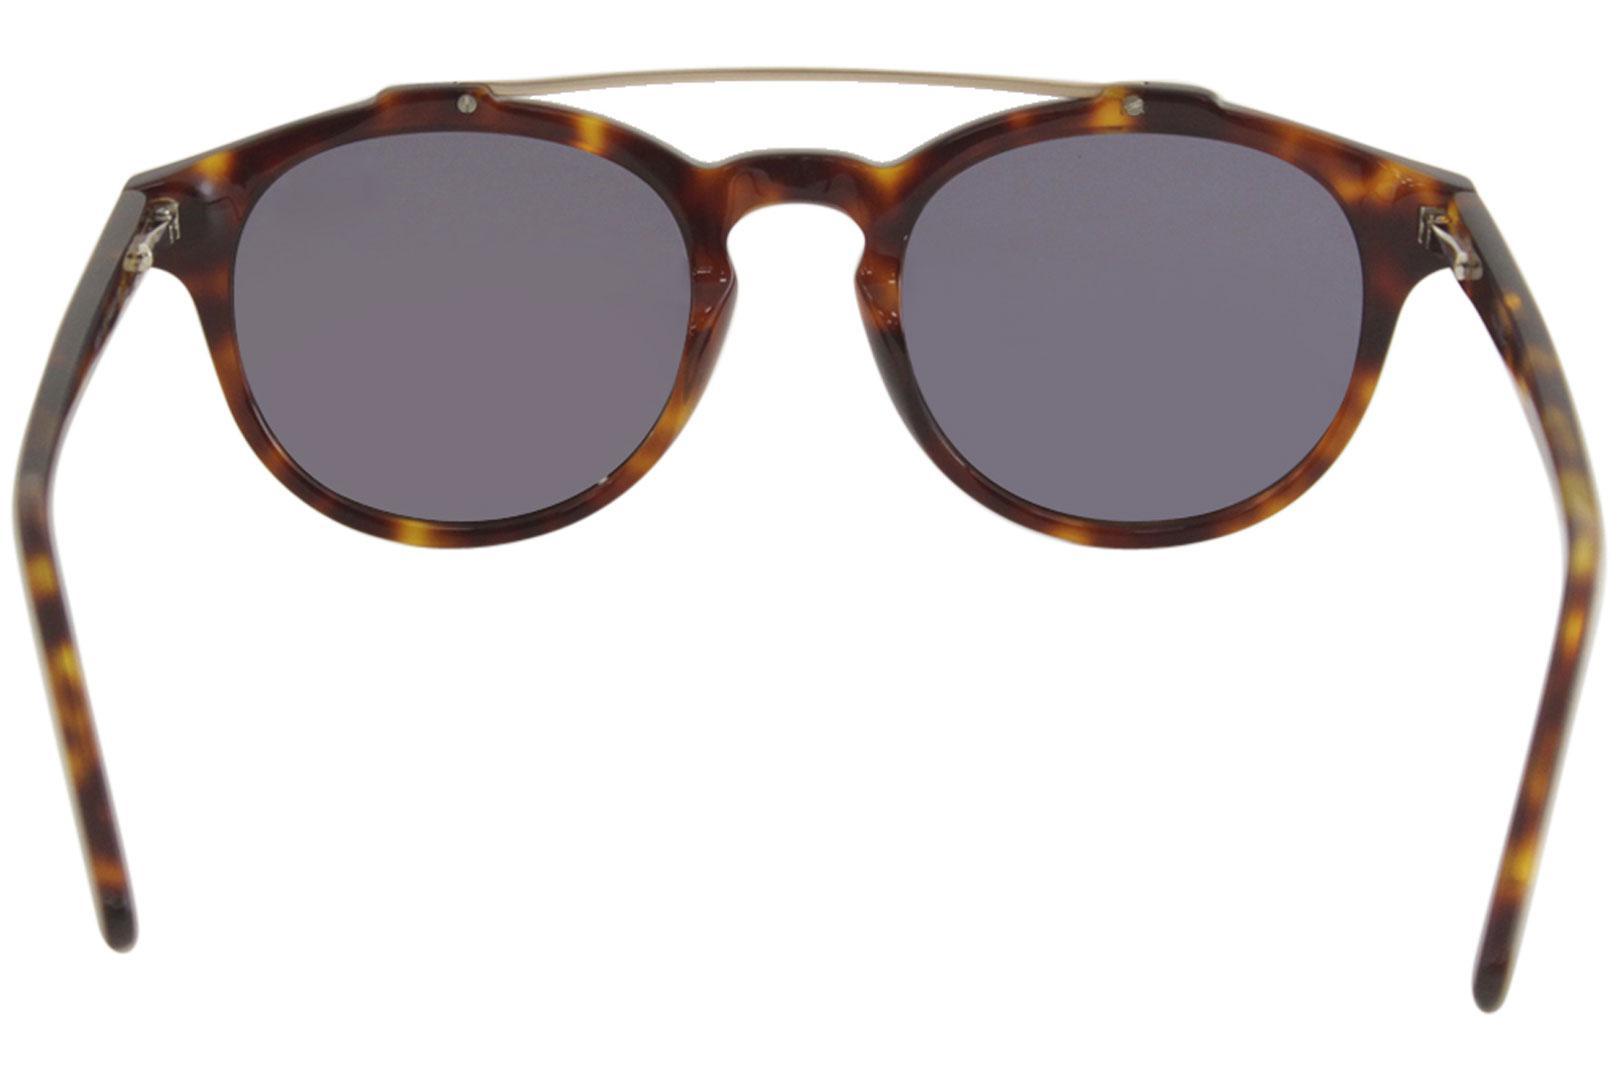 465edf6185e4f Nicole Miller Women s Rose Fashion Pilot Sunglasses